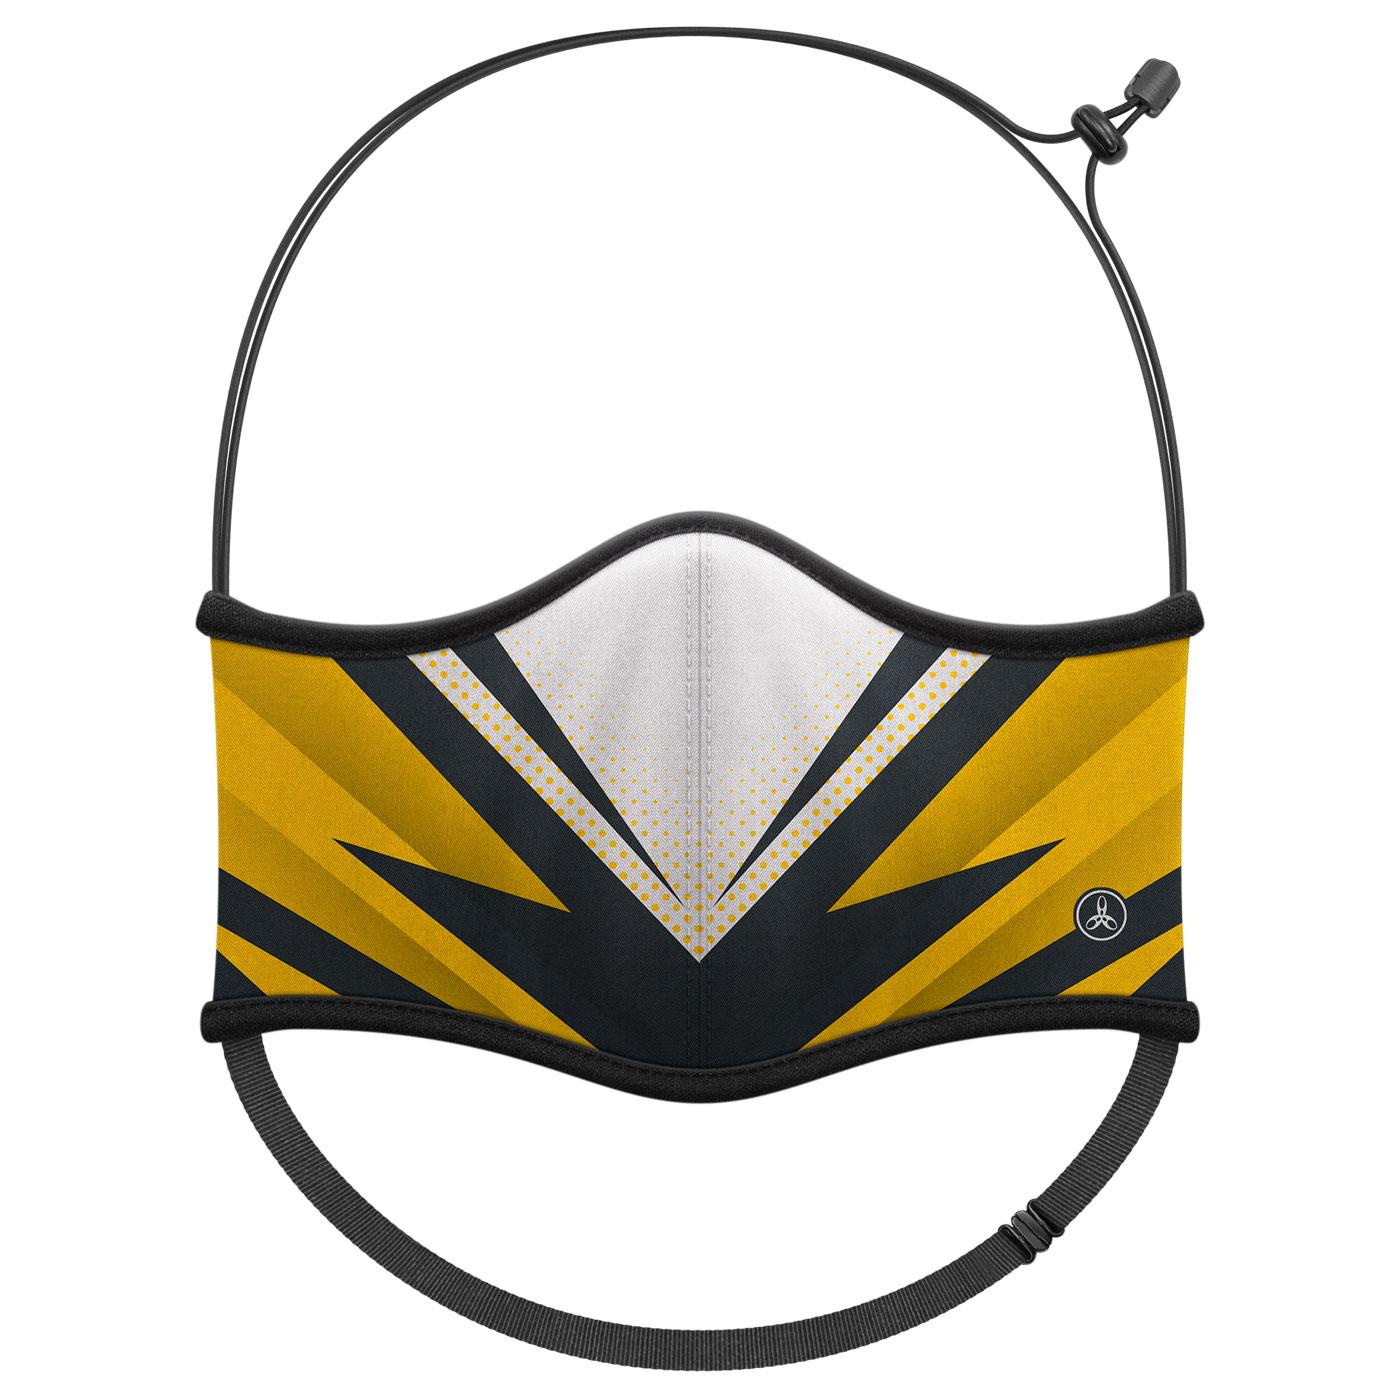 HODARLA 運動舒適口罩6032213 - 黃黑白